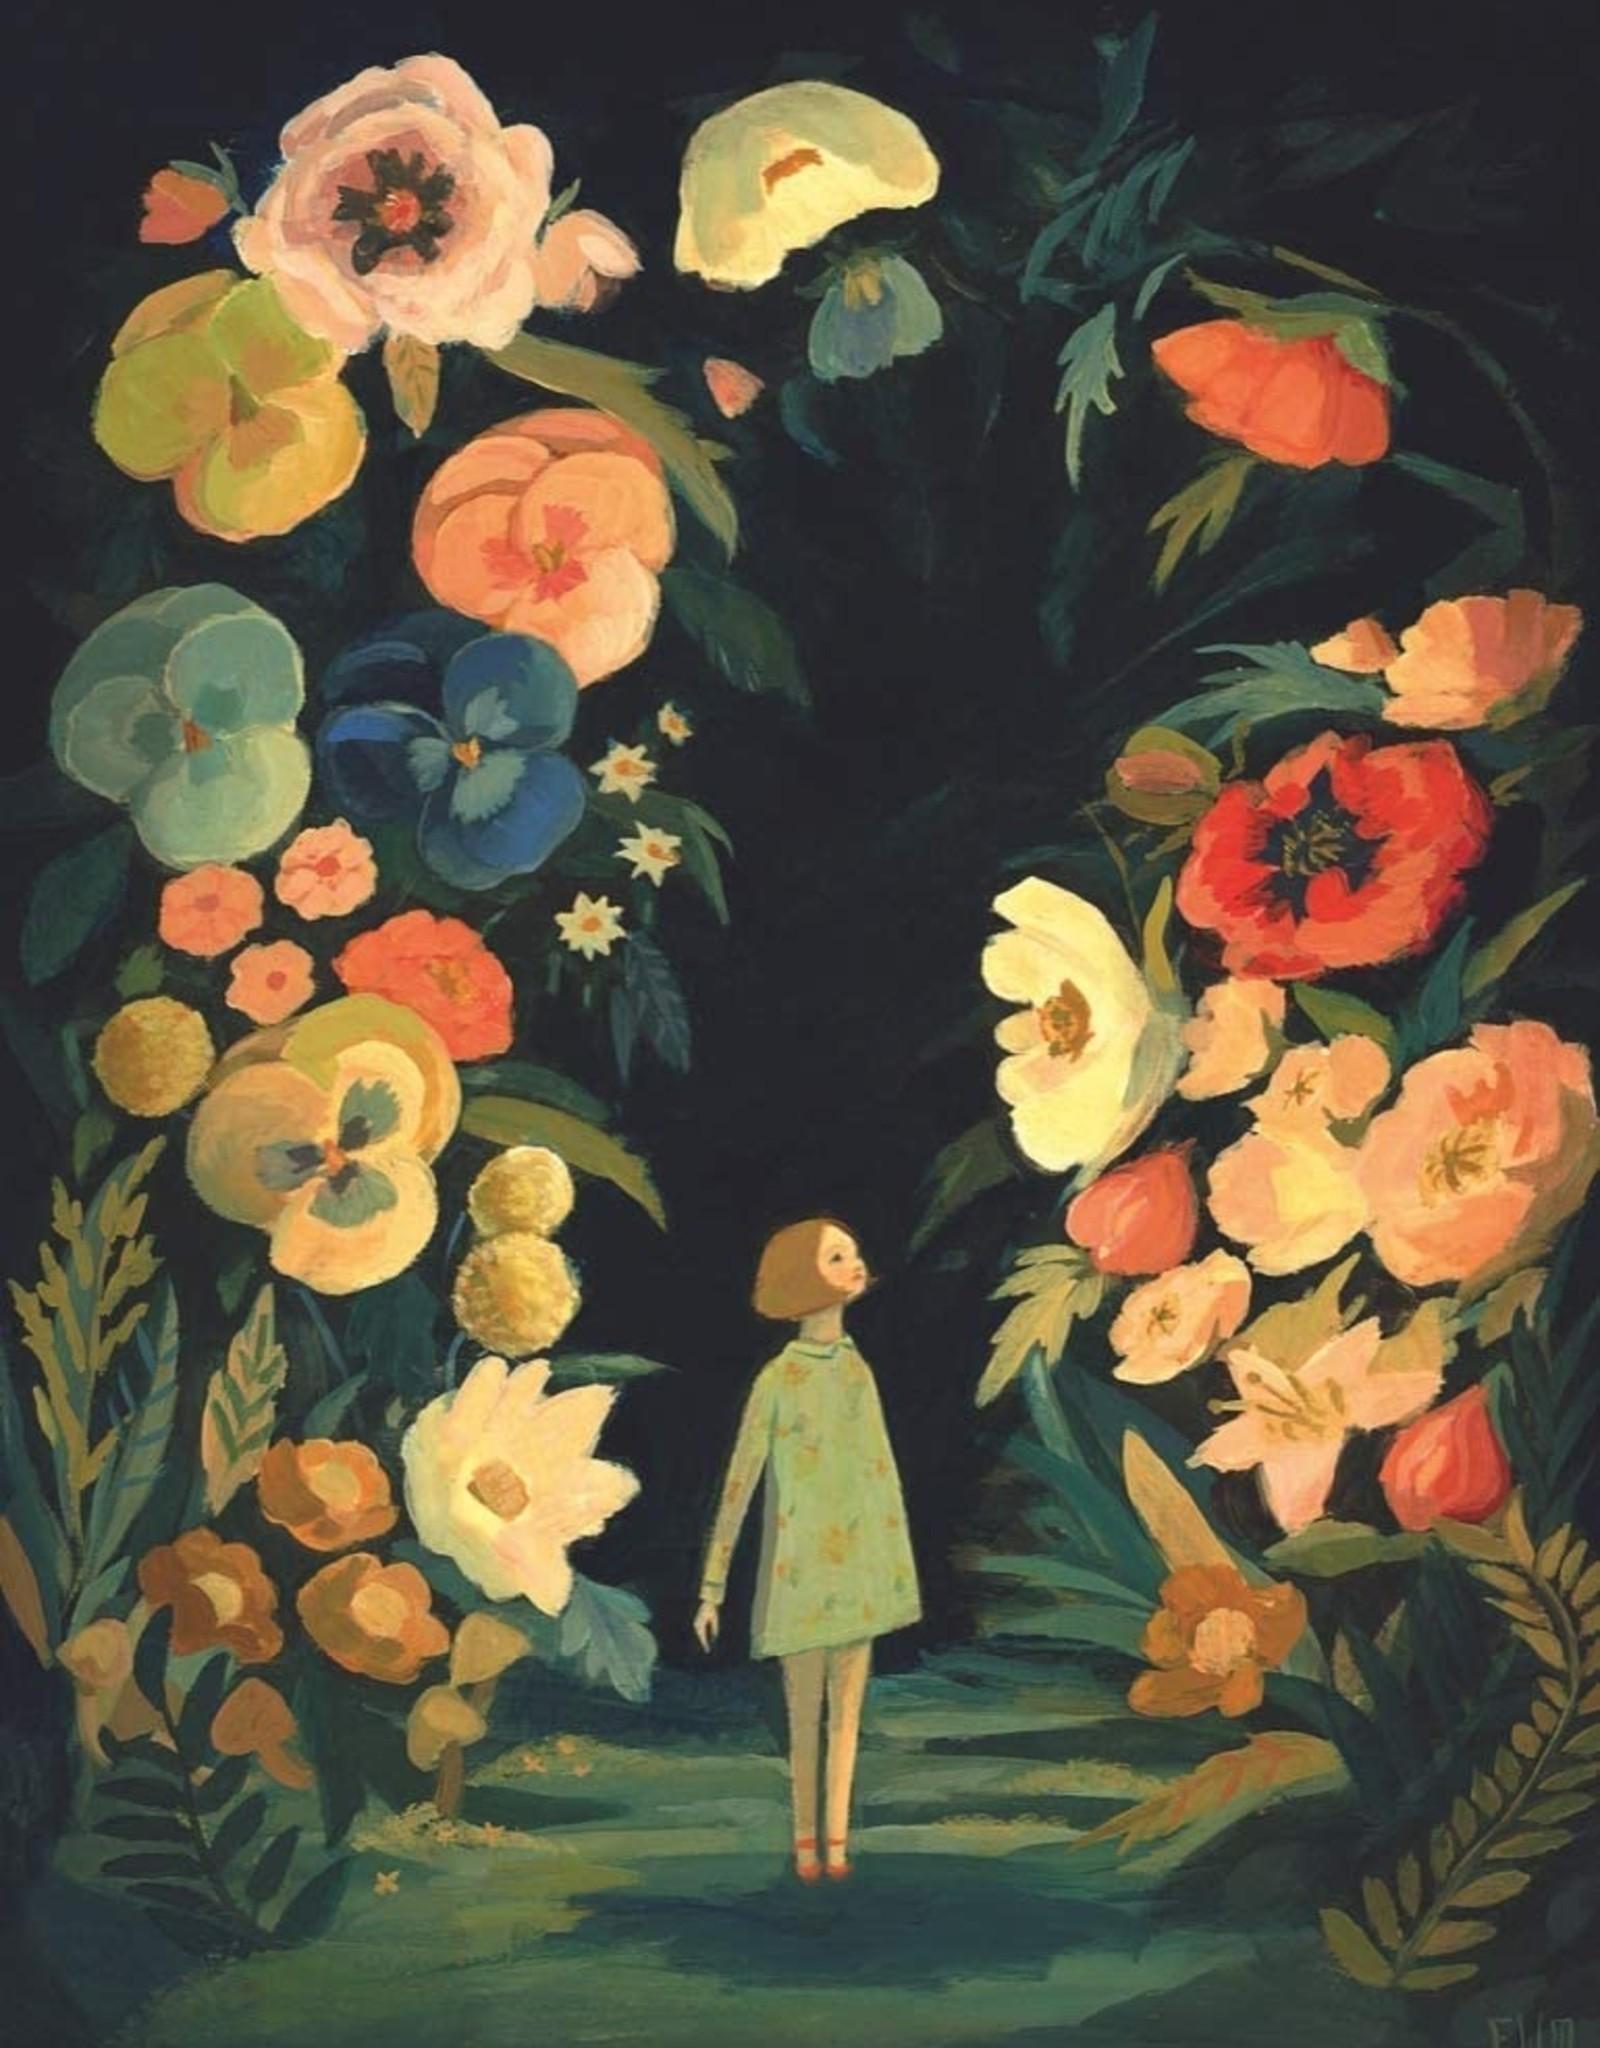 Puzzle The Night Garden